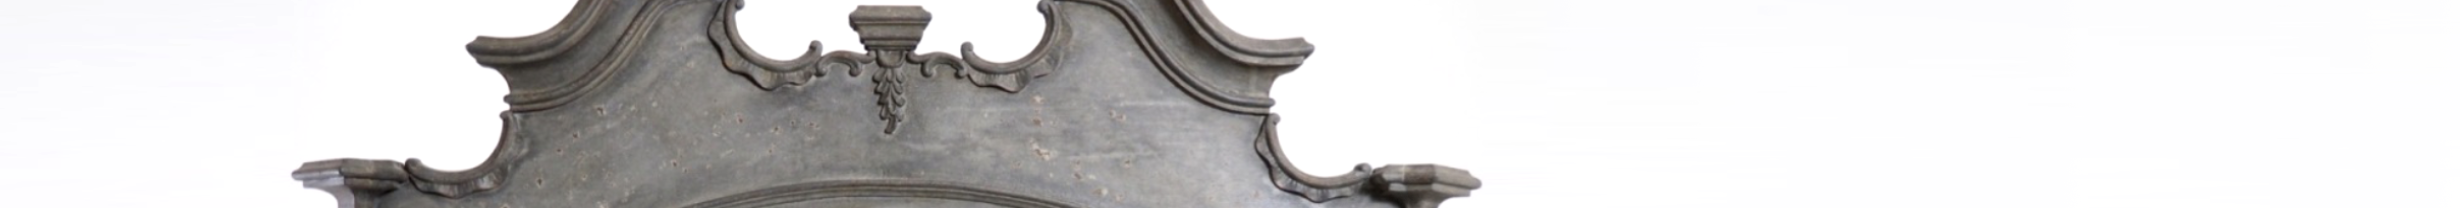 Gustavian+cabinet+test+foto.png